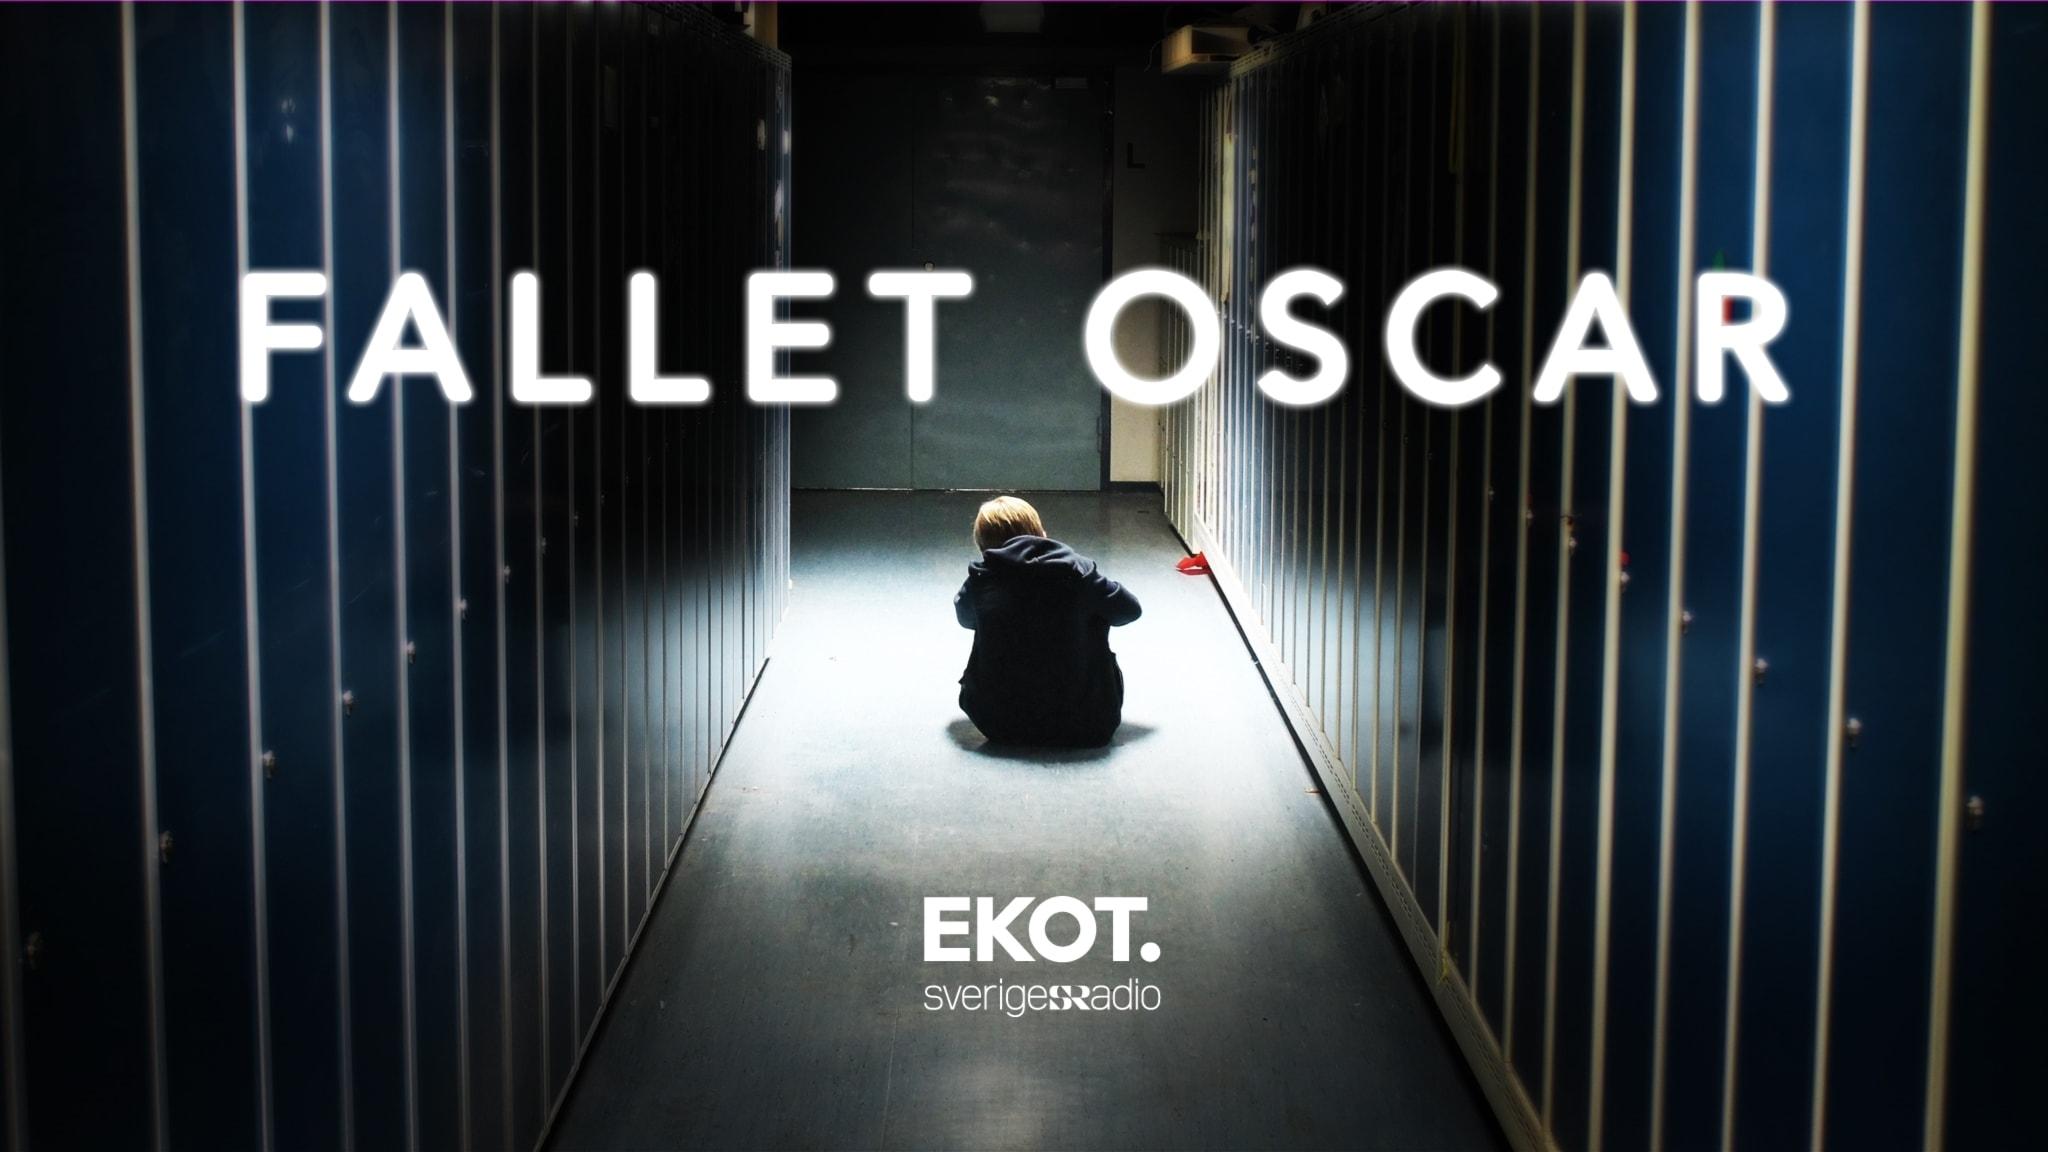 Fallet Oscar: Del 1 - Skolpersonal håller ner Oscar gång på gång